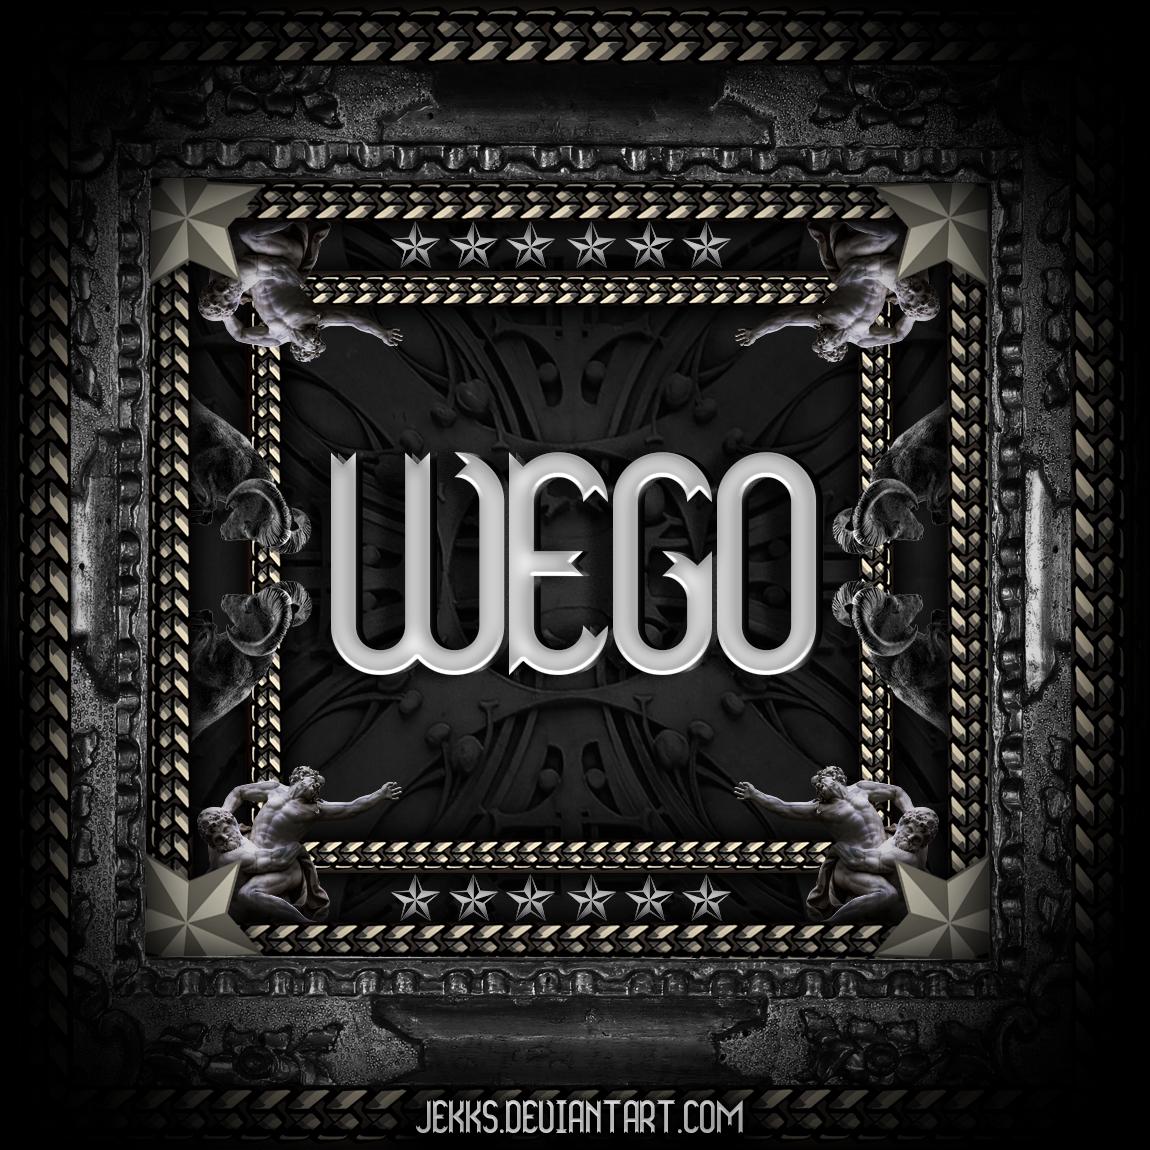 Wego mixtape cover by jekks on deviantart for Free mixtape covers